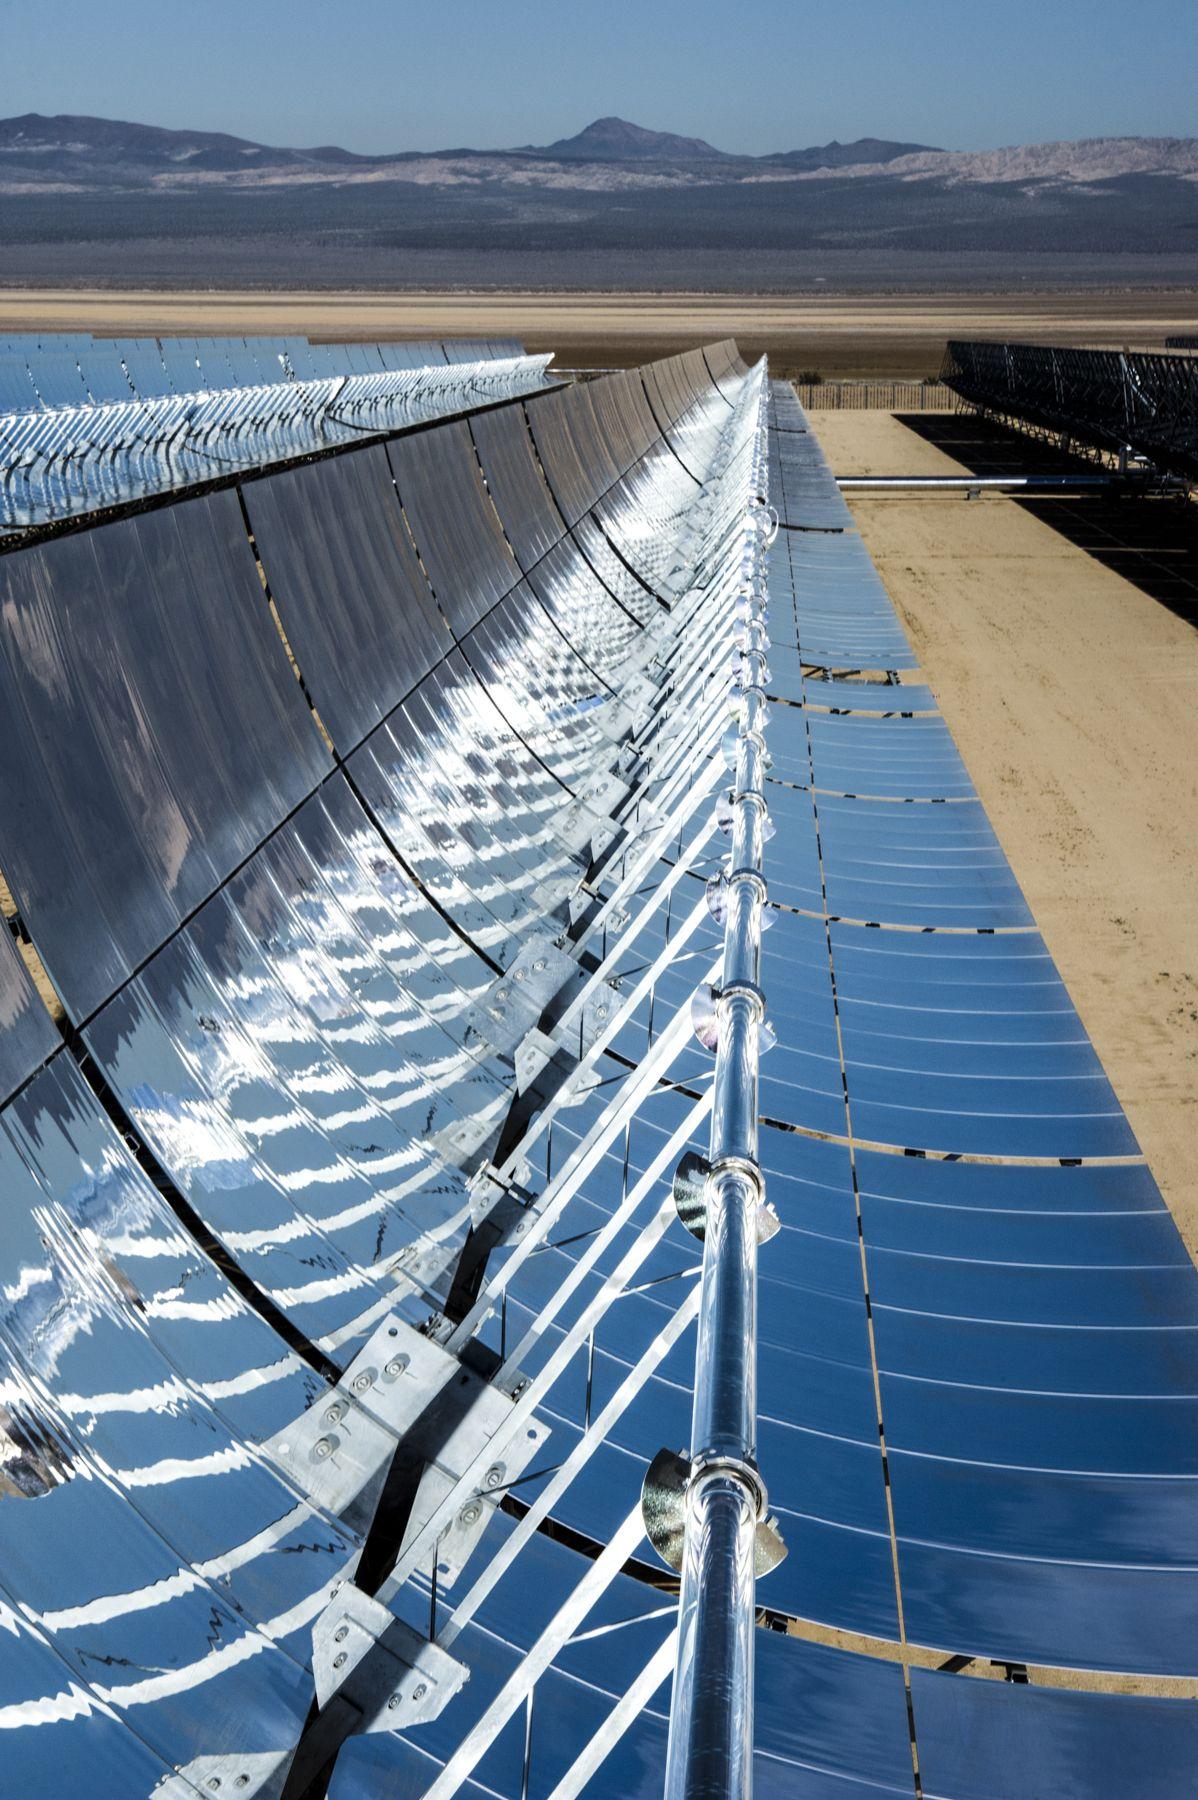 saydam gunea panelleri ile gunea enerjisinden daha fazla yararlanmak